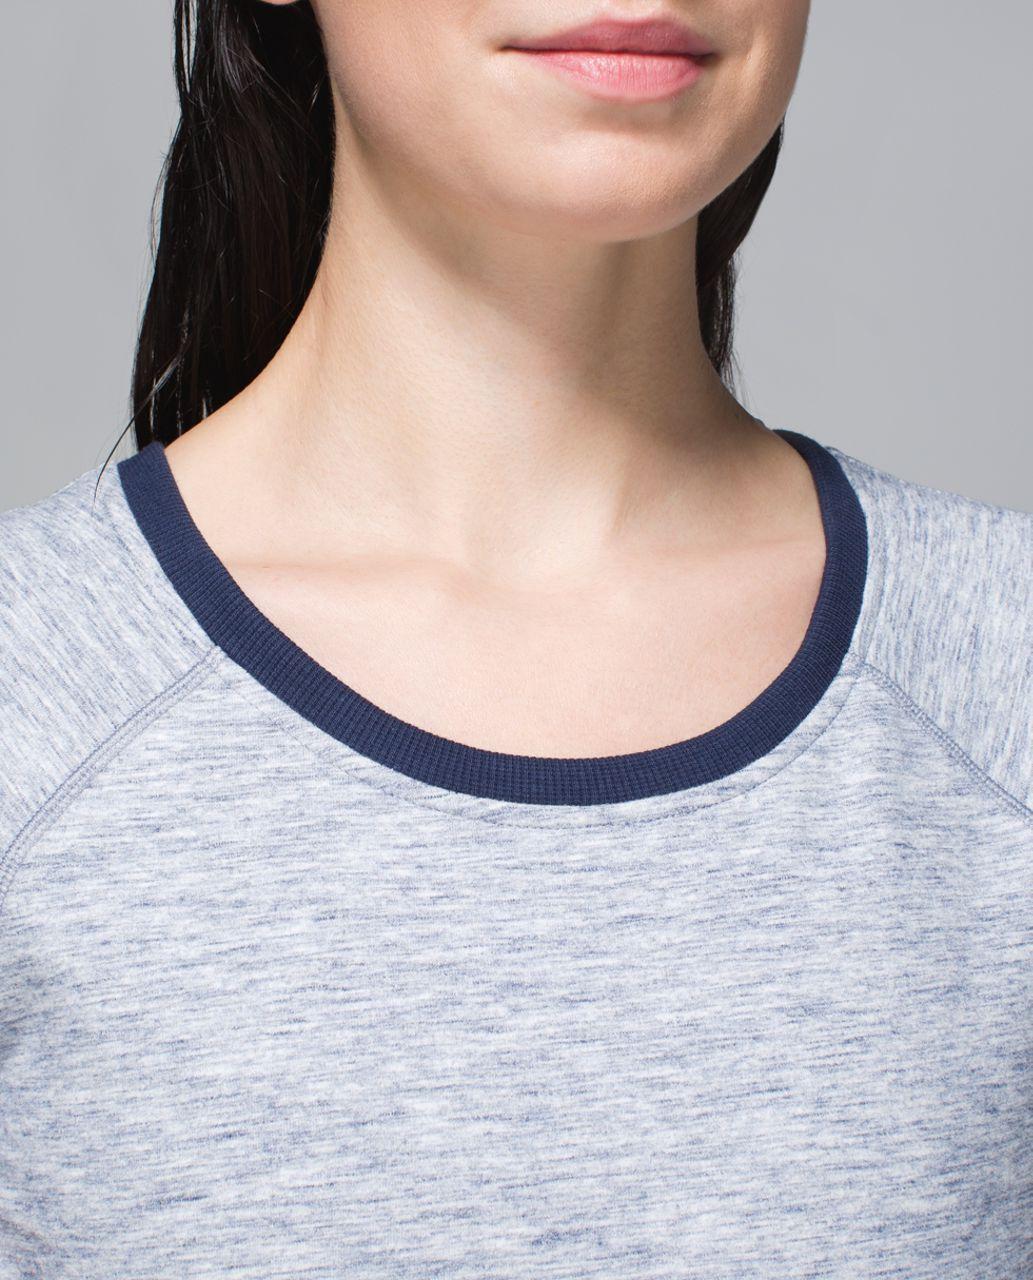 Lululemon Cut Above Dress - Heathered Space Dyed Gris / Deep Navy